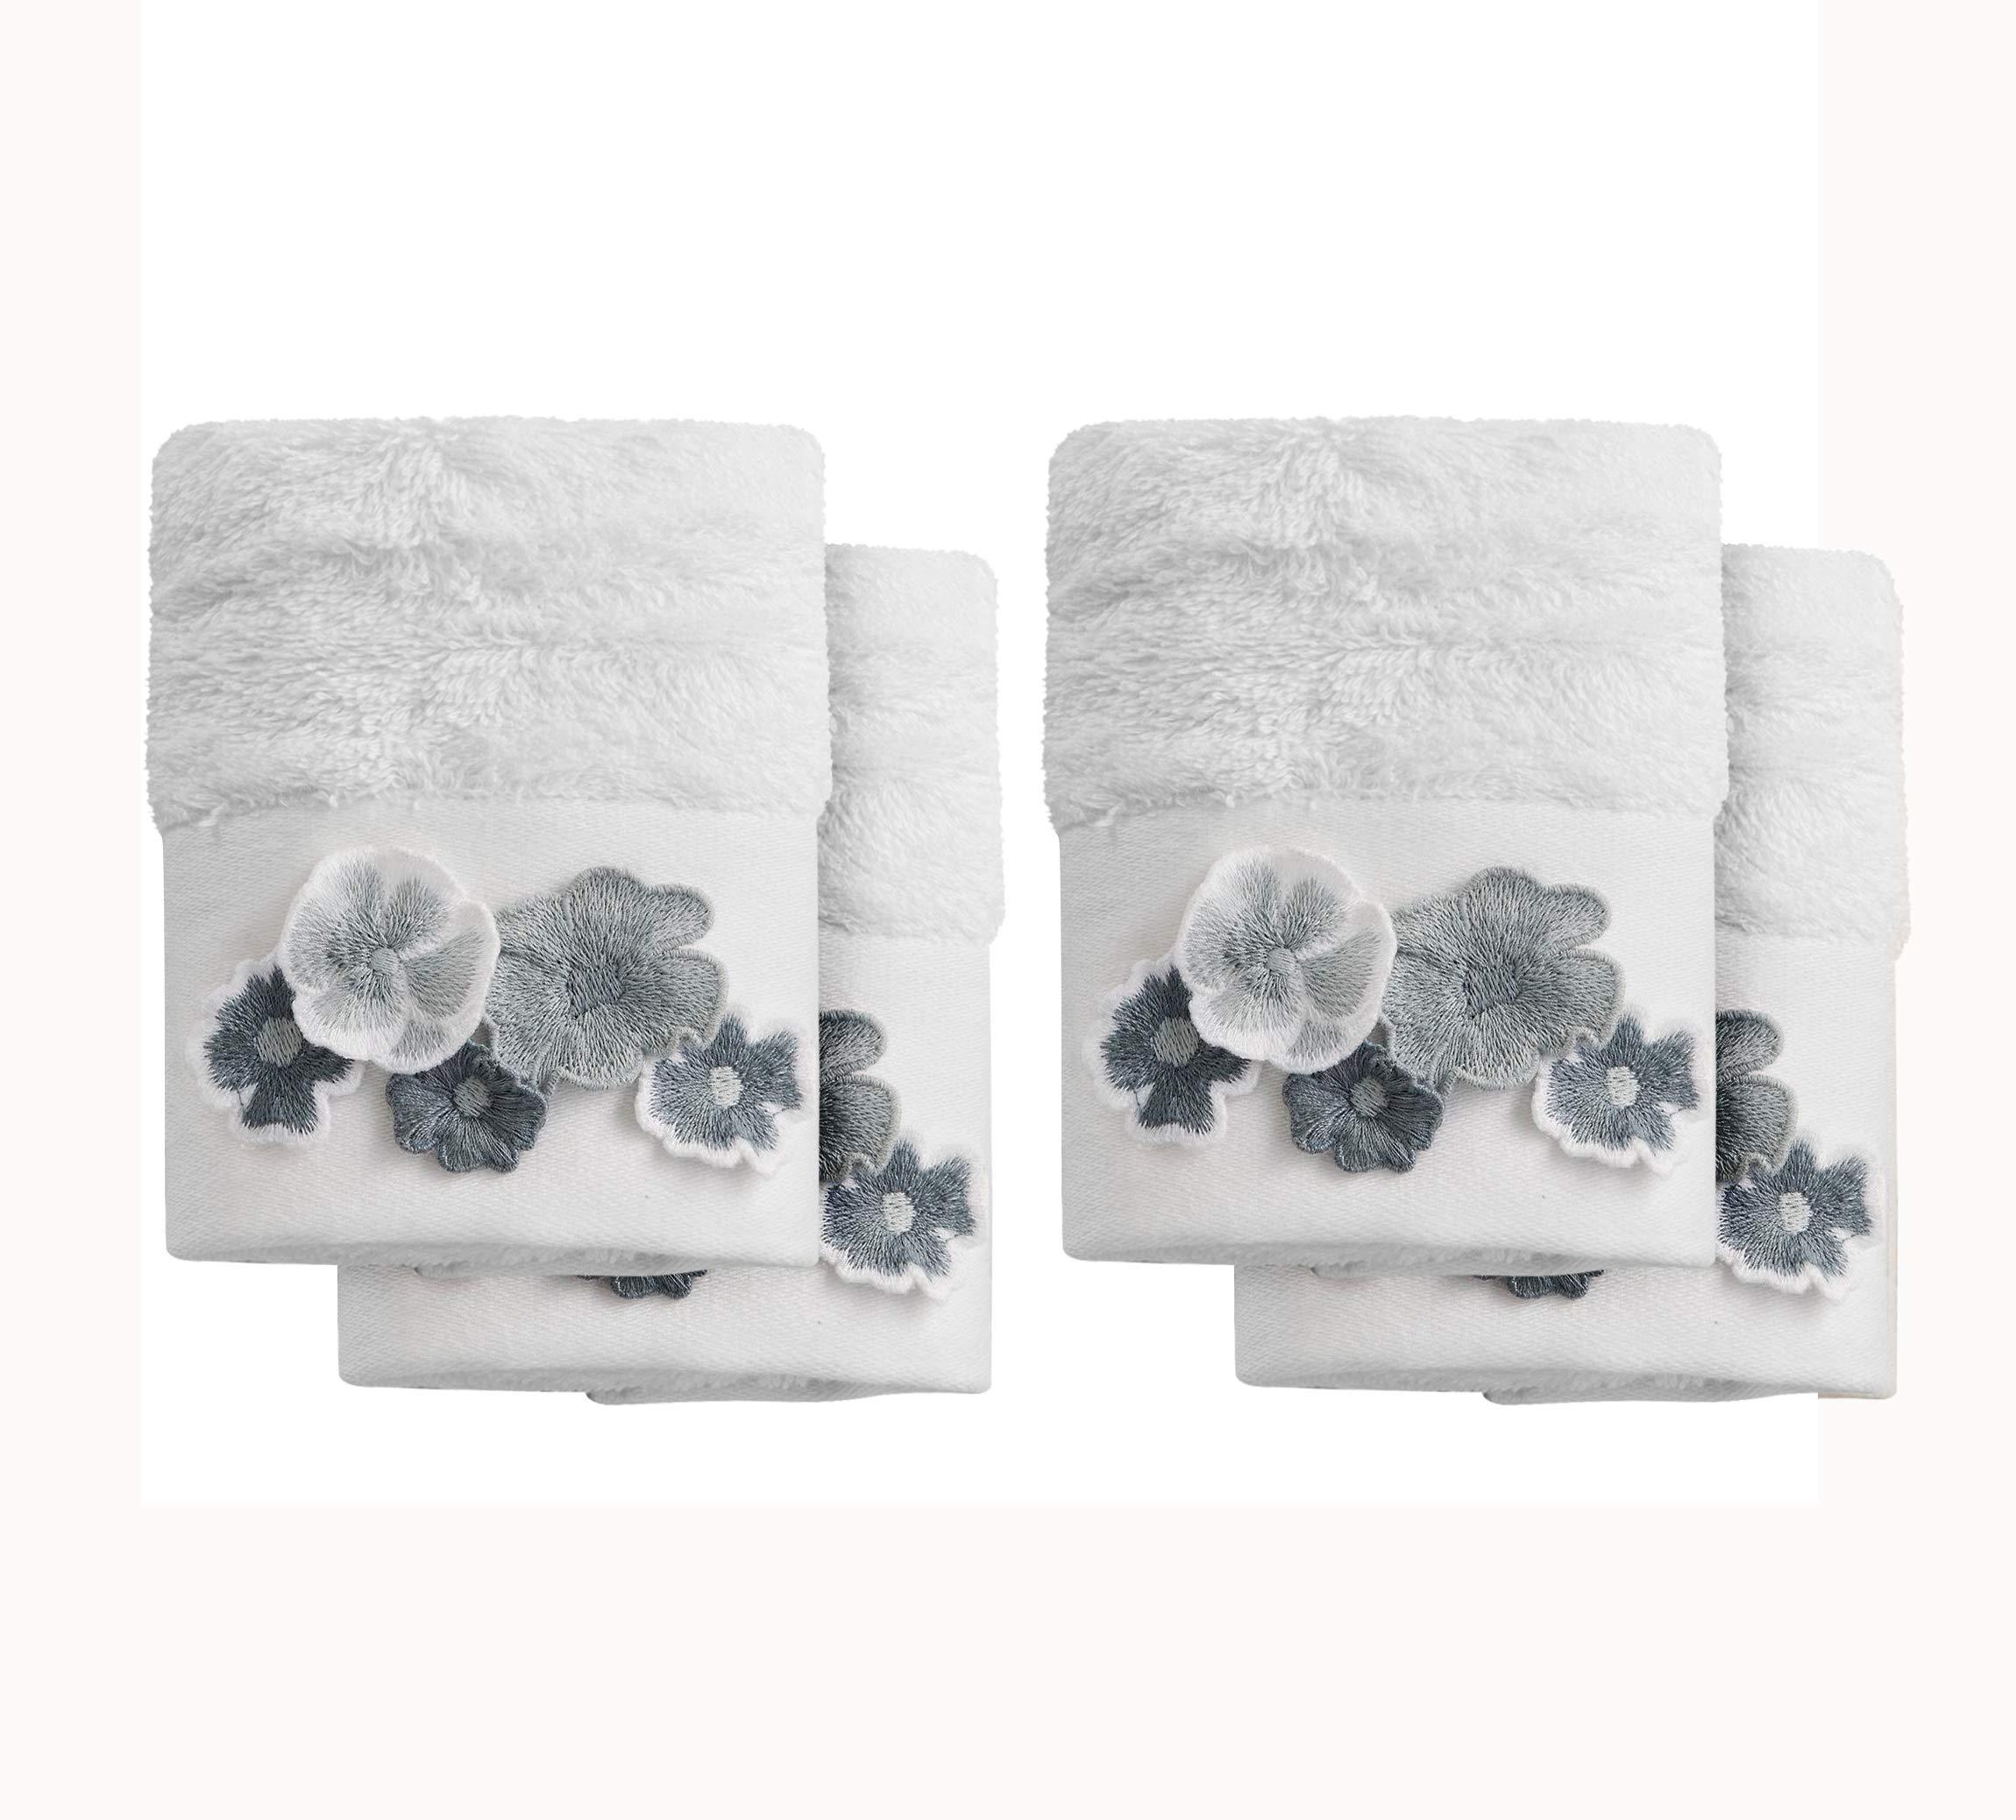 Chakra Floral Fingertip Bamboo Towel Set of 4-11''x19'' Premium Turkish Guest Bathroom Bath Linens, Facecloths, XL Washcloths, Elegant, Multipurpose for Hand, Face, Bath, Great Gift